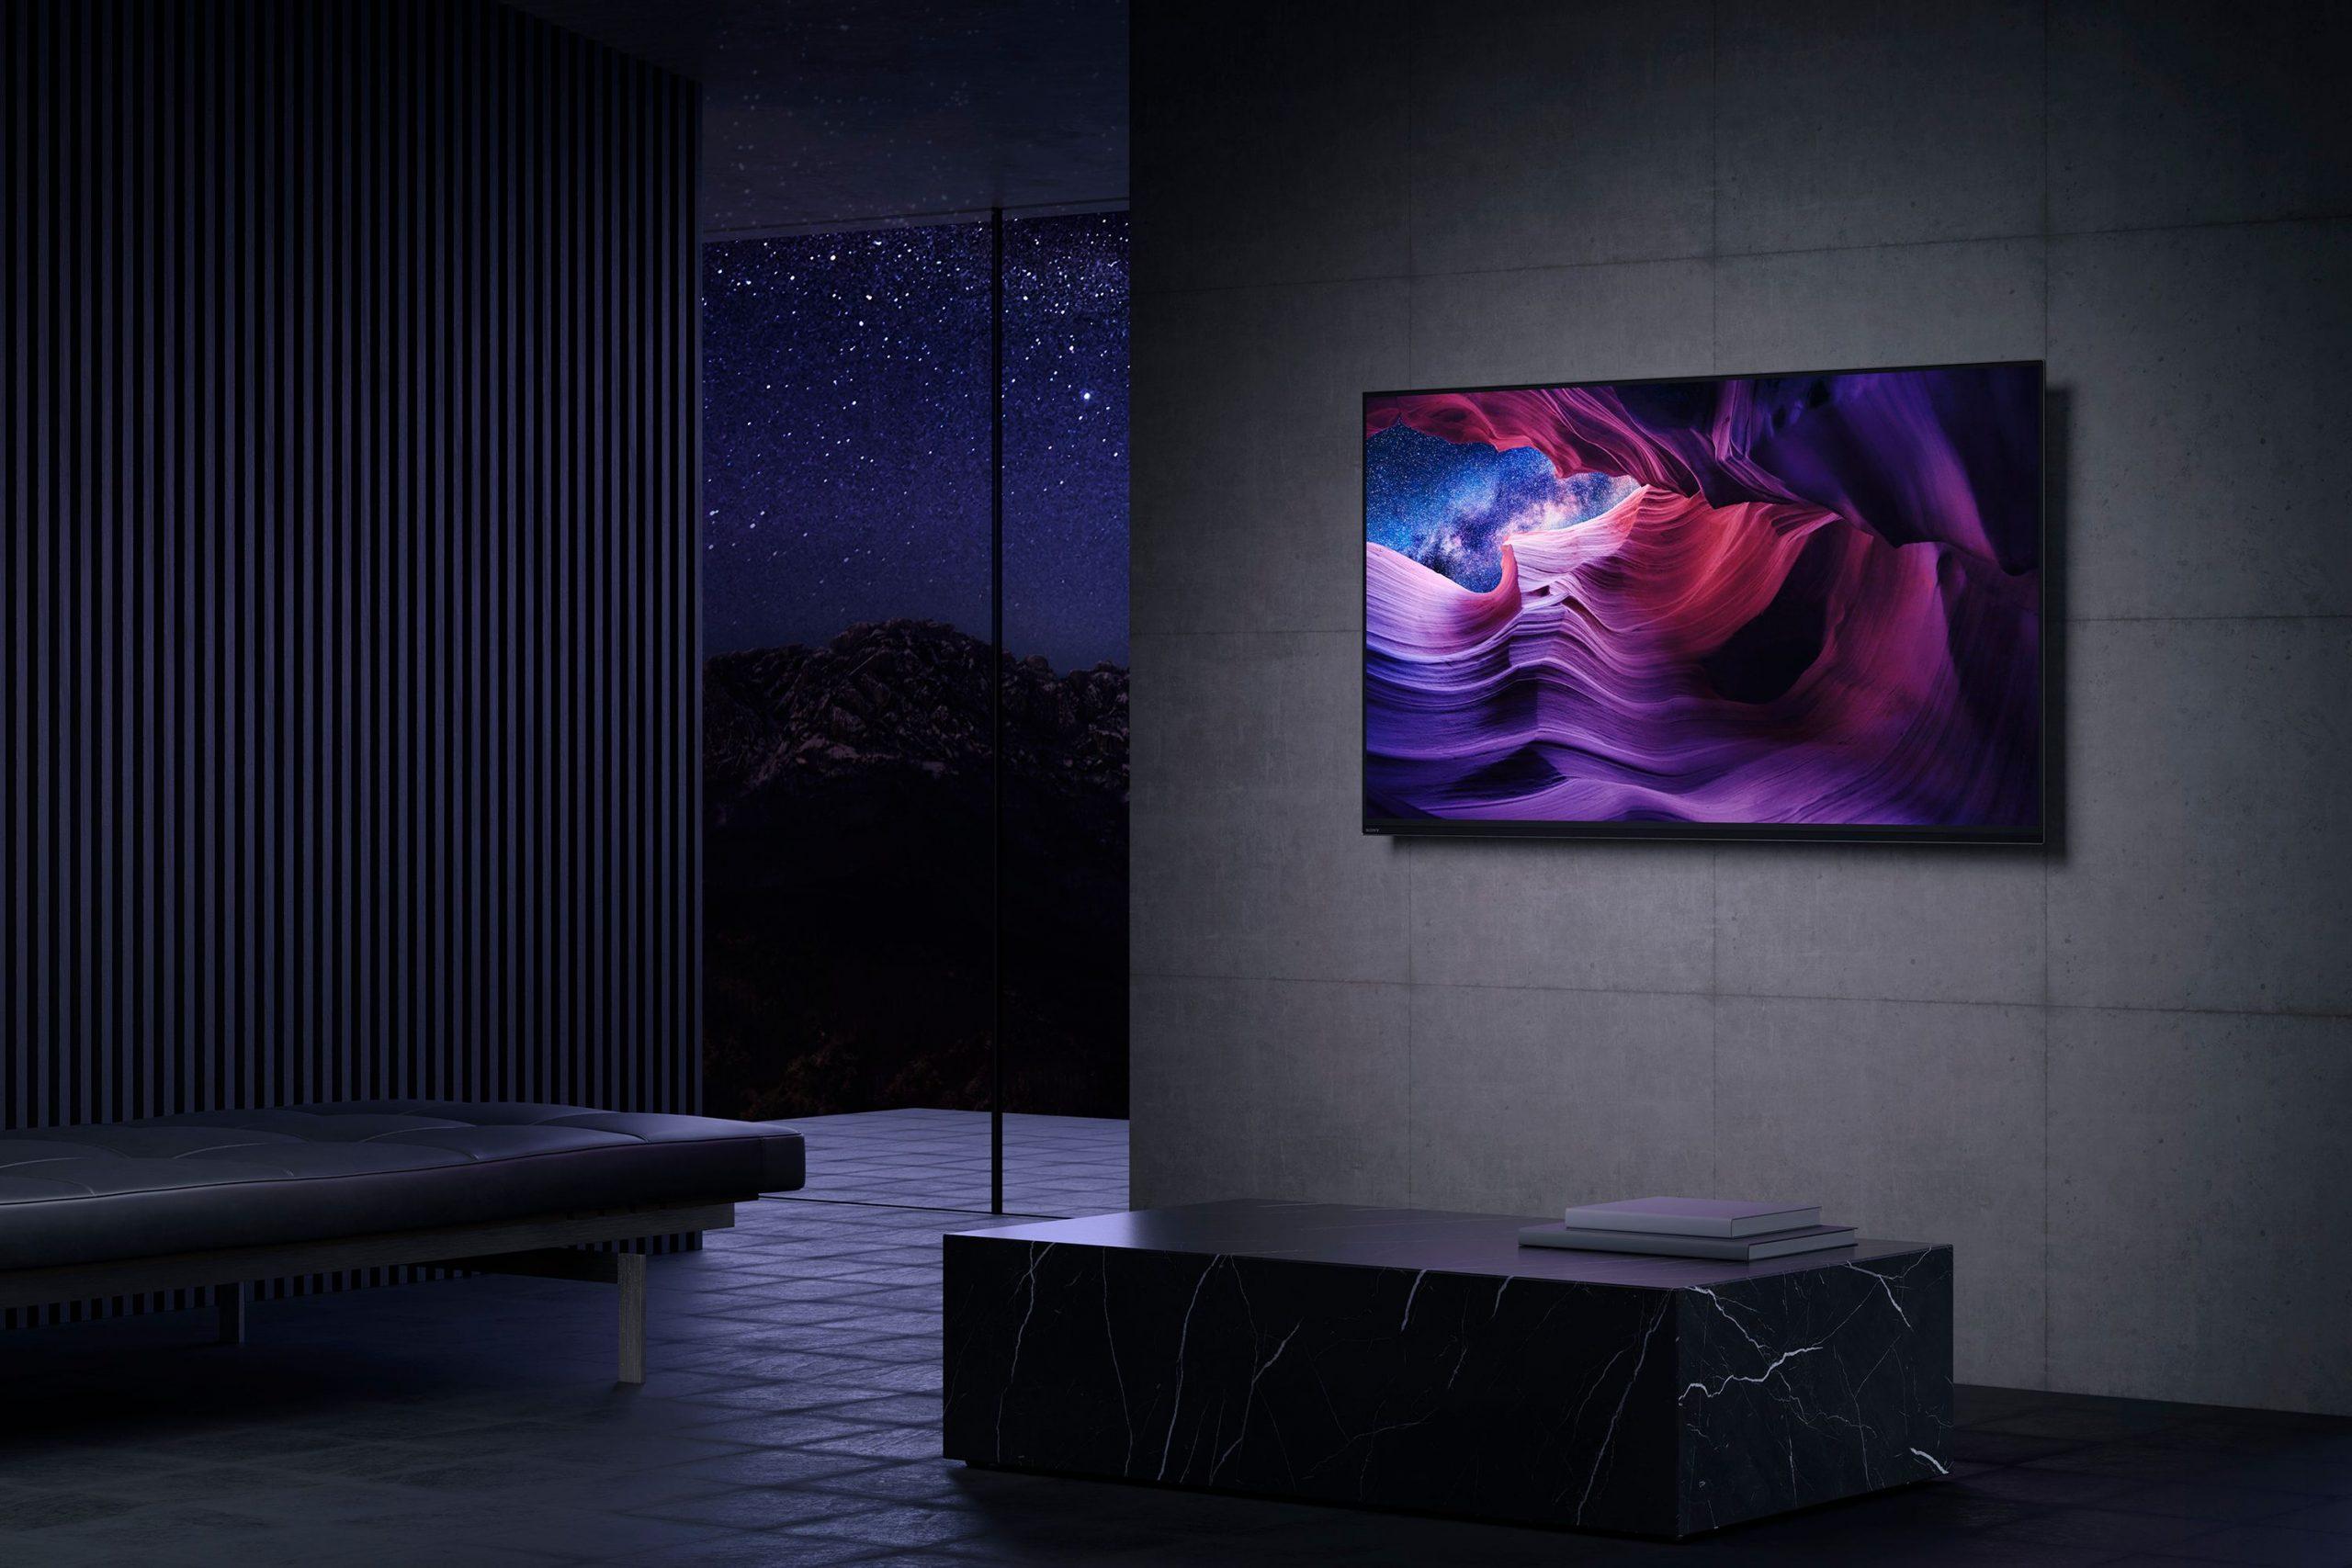 A9 4K HDR OLED TV